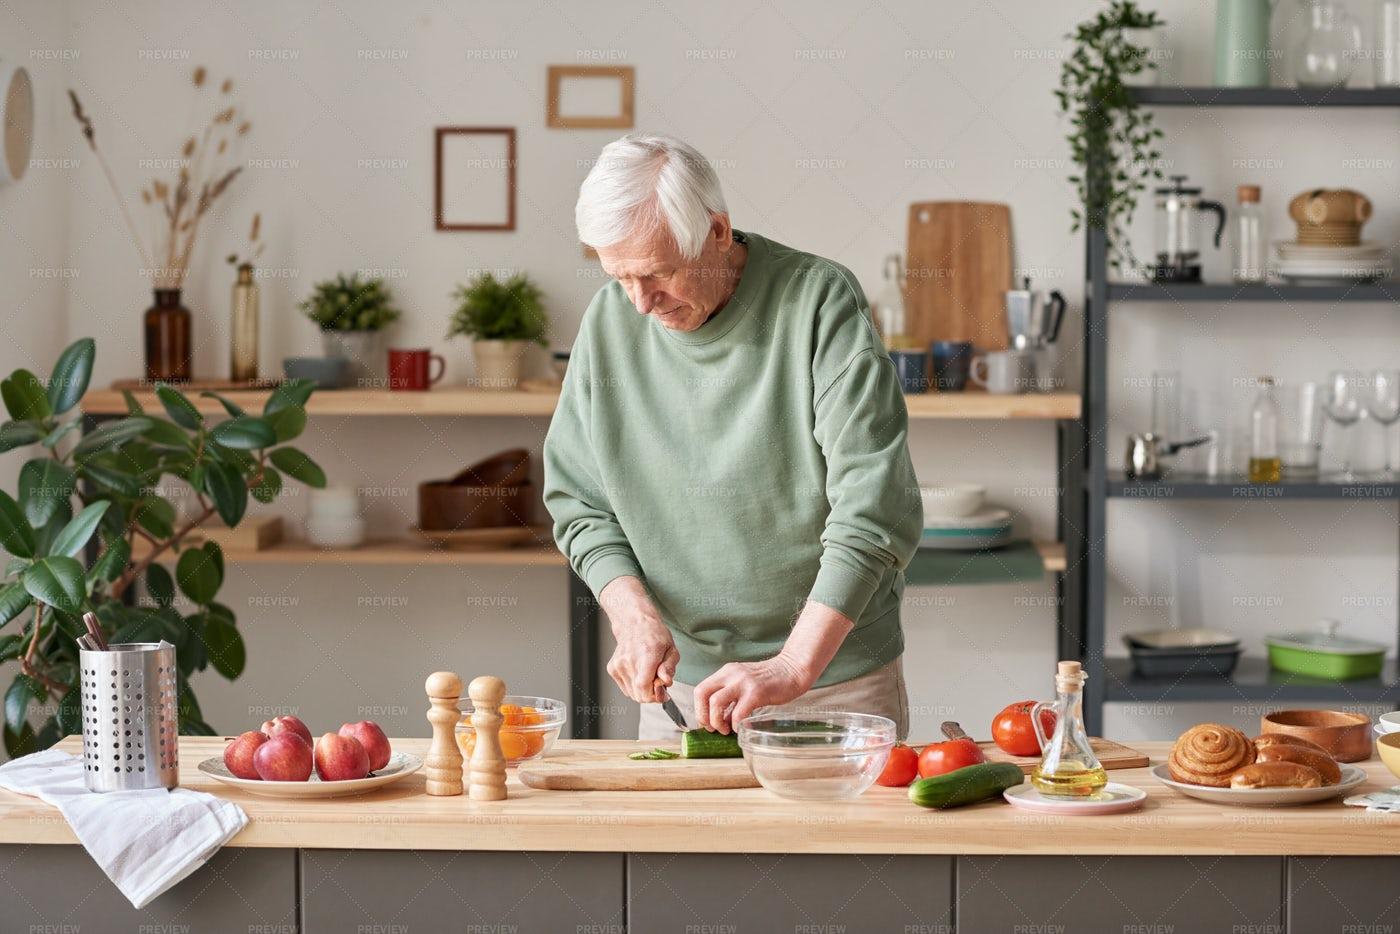 Man Preparing Food In The Kitchen: Stock Photos